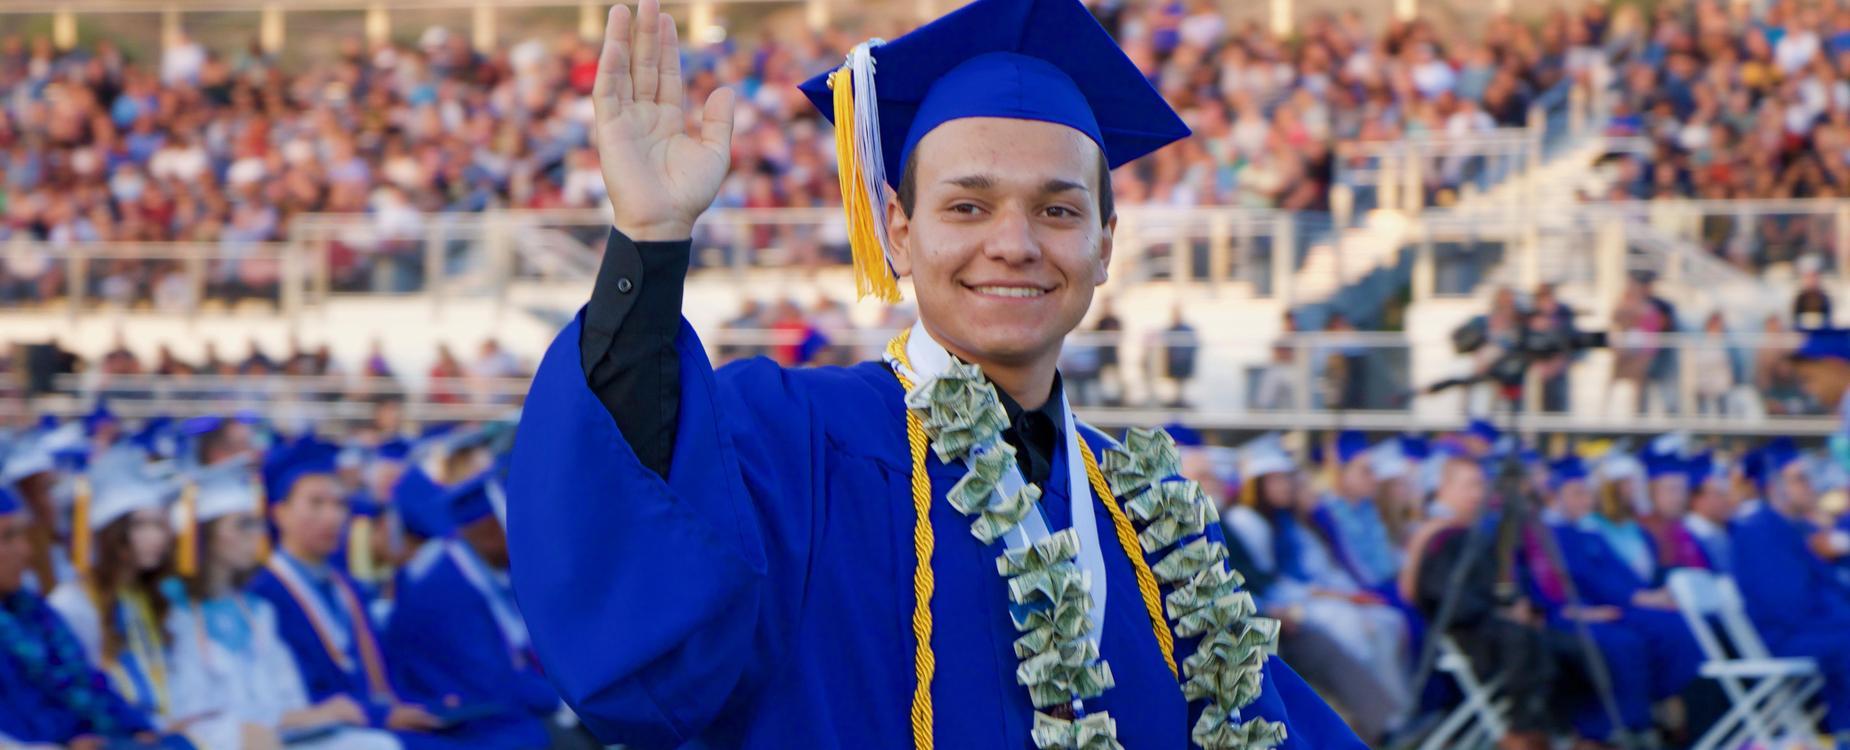 Graduate waving to crowd